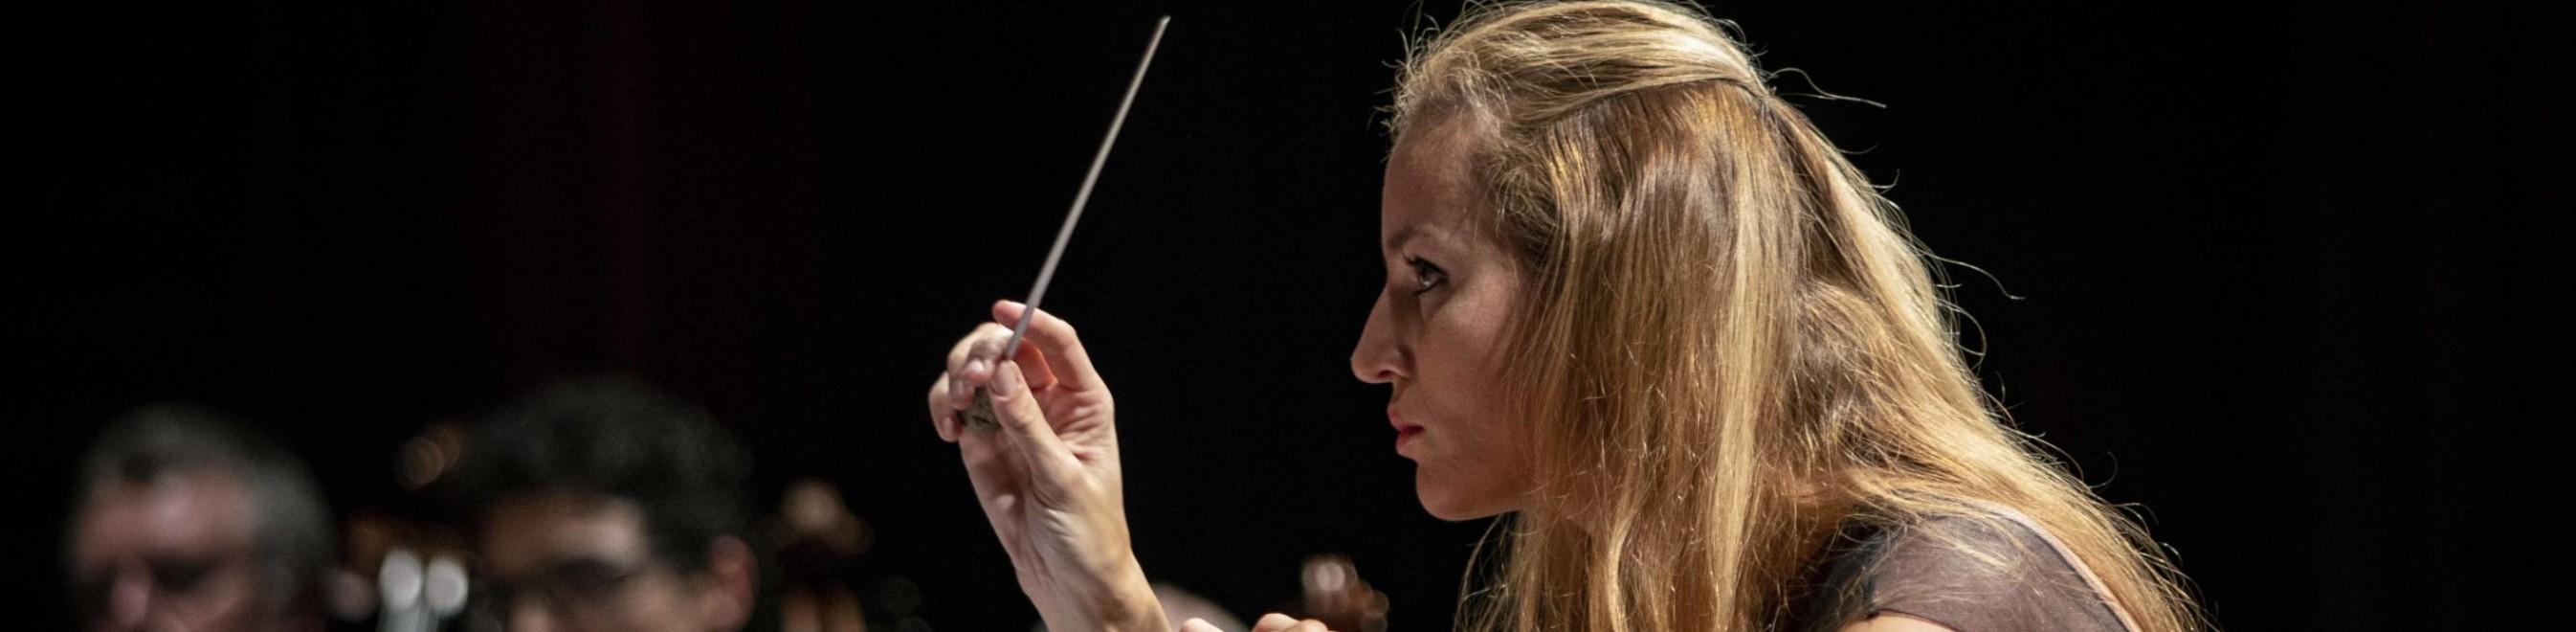 11/9 - MASCAGNI GALA Concerto lirico sinfonico